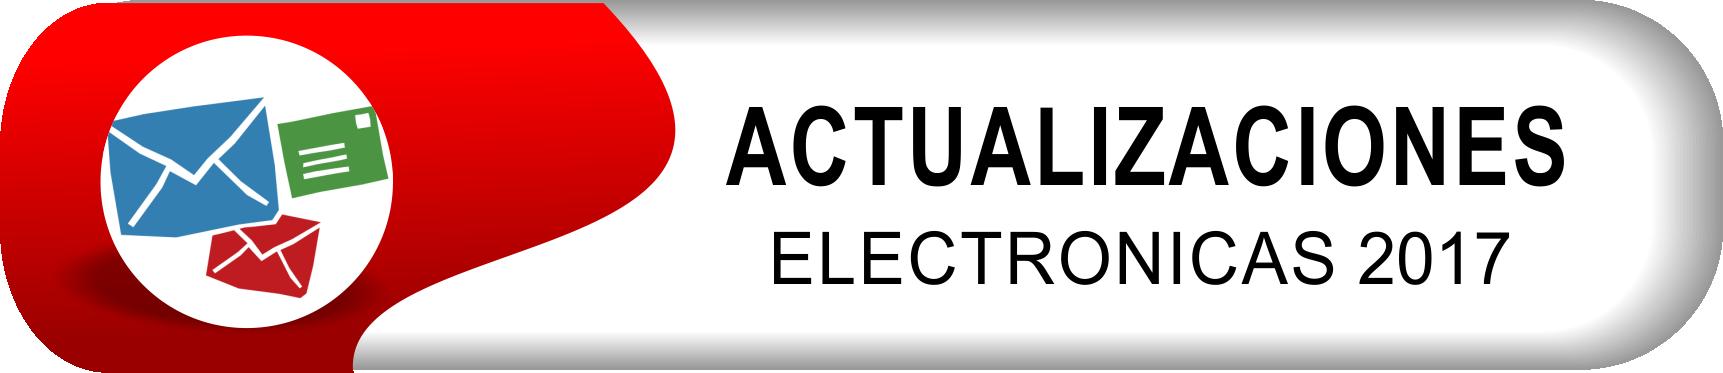 boton actualizac electr17.png